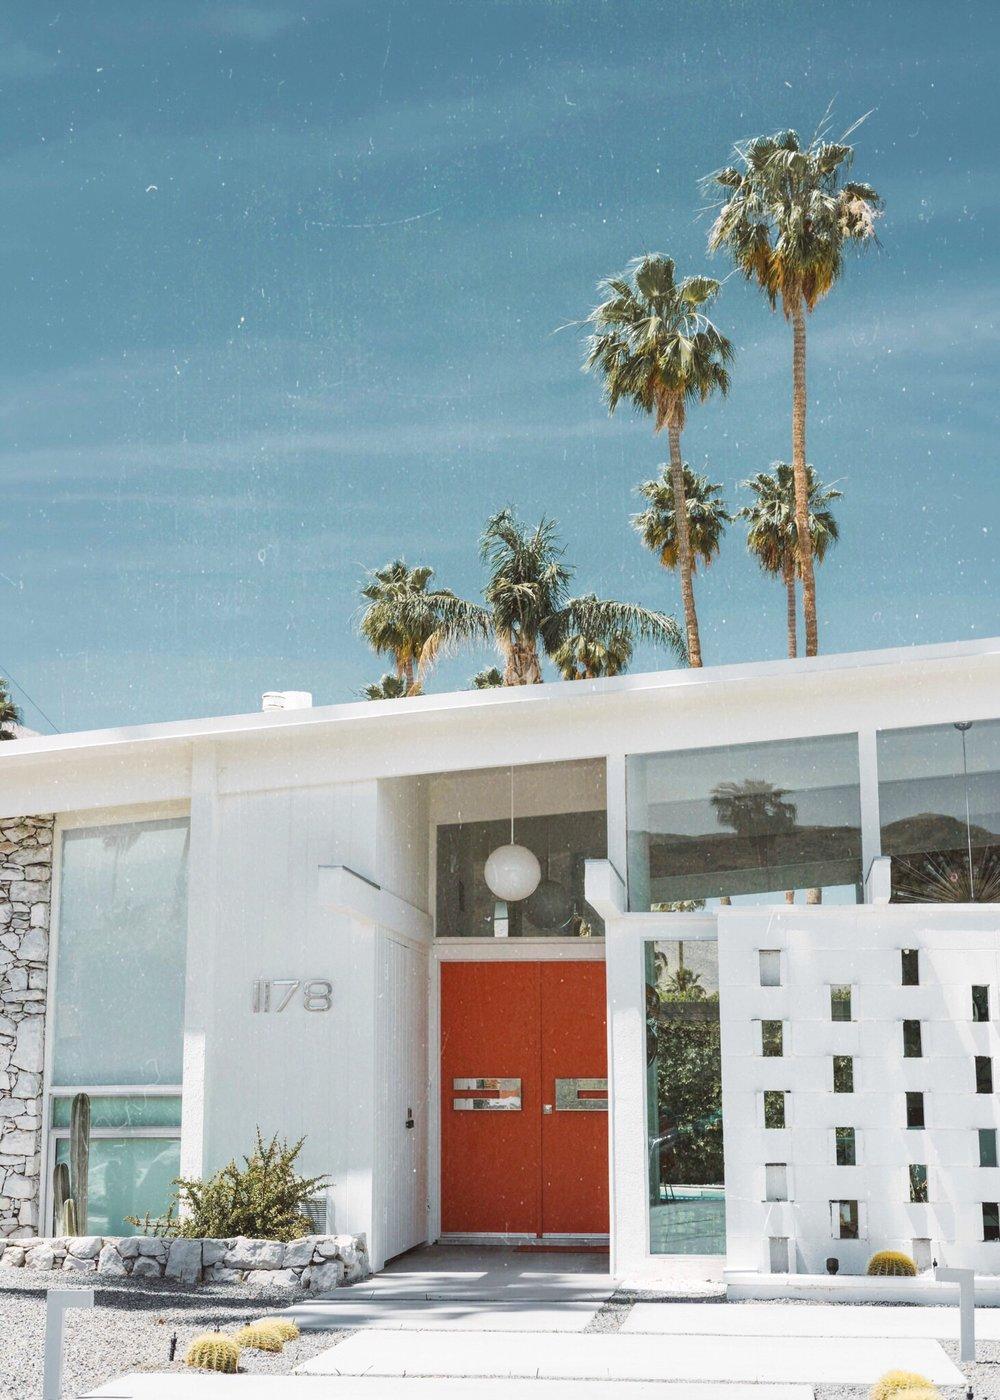 PALM_SPRINGS_CALIFORNIA_HOUSE_MCM_MID_CENTURY_MODERN